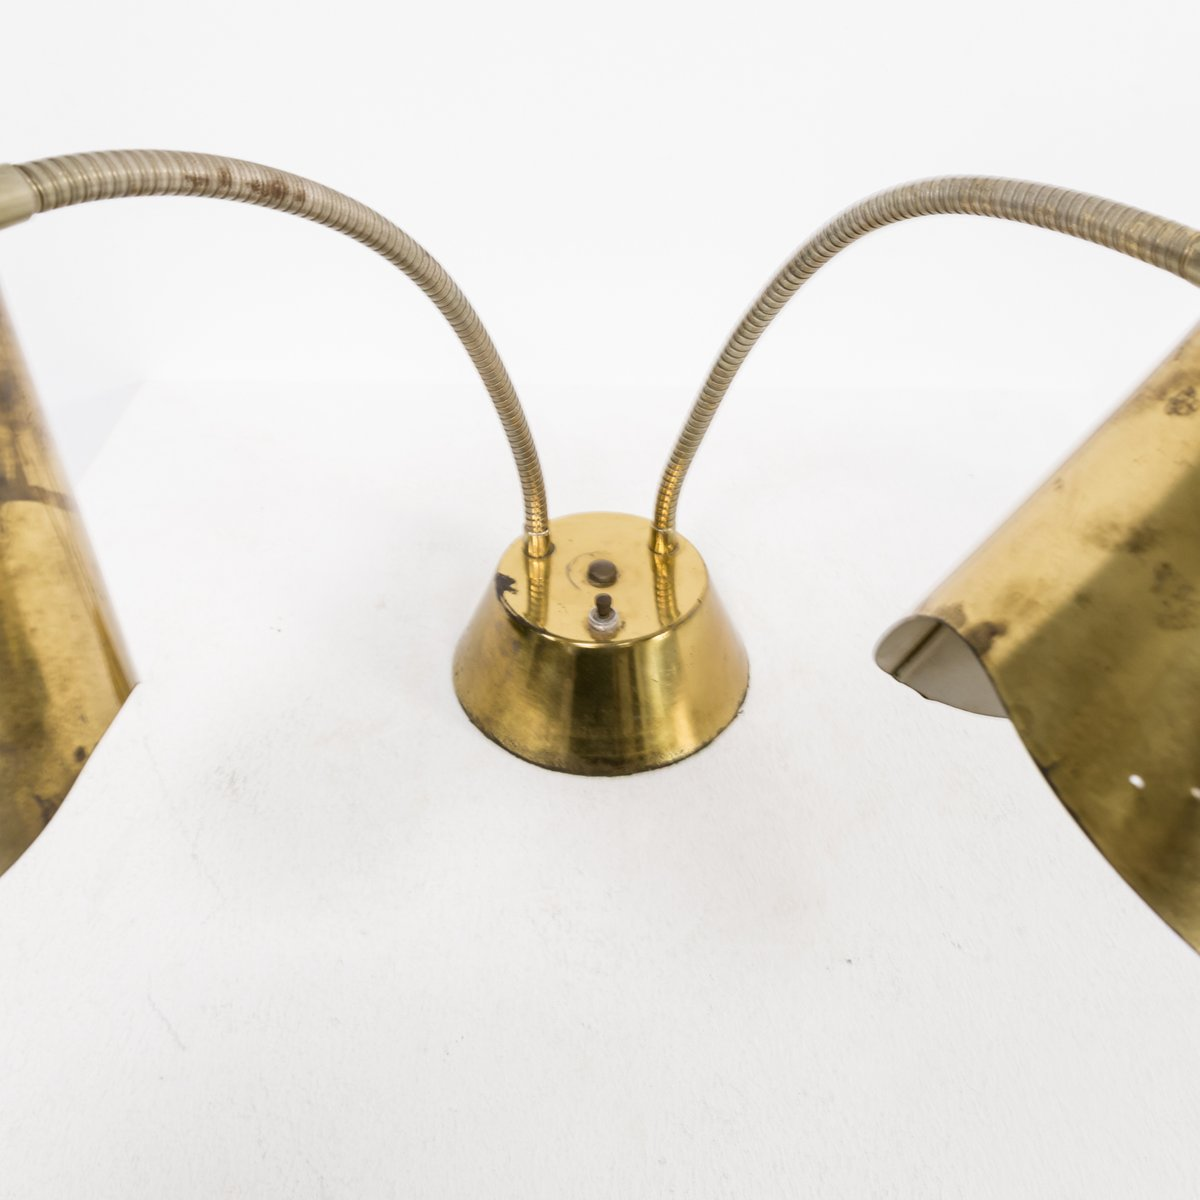 Groß Pvc Lampe Draht 22 Awg 2 Kond Galerie - Elektrische Schaltplan ...